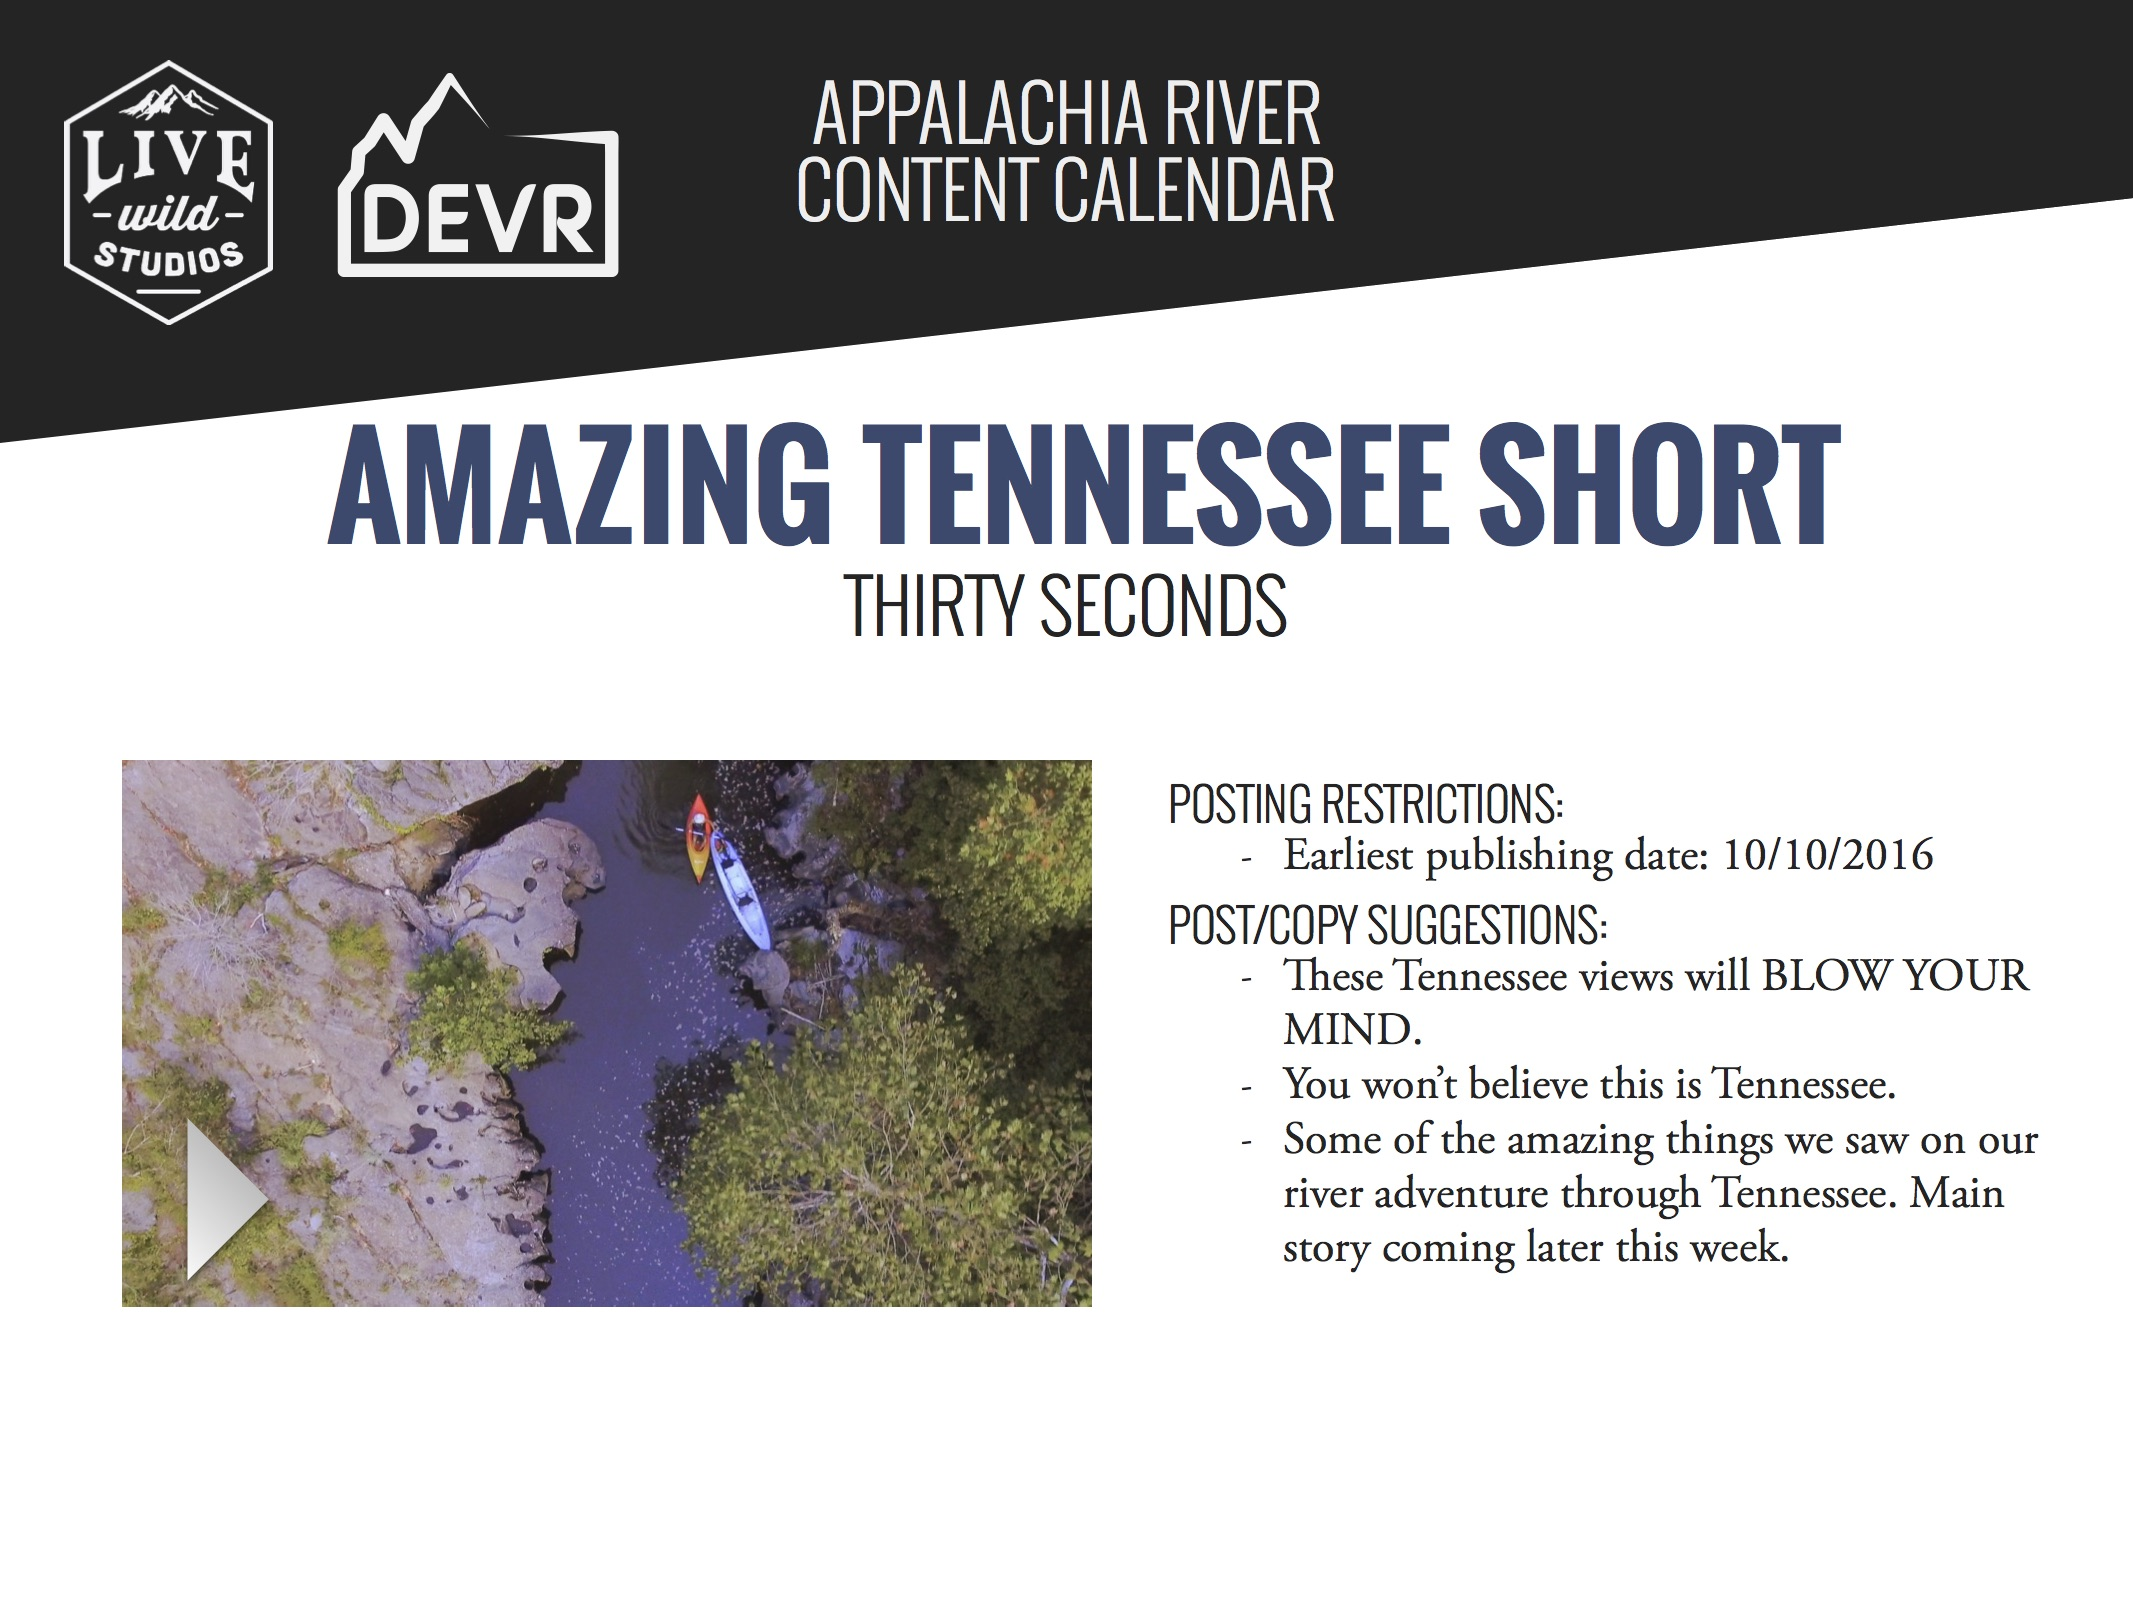 Appalachia River Adventure 2016 Campaign Guide 6.jpg